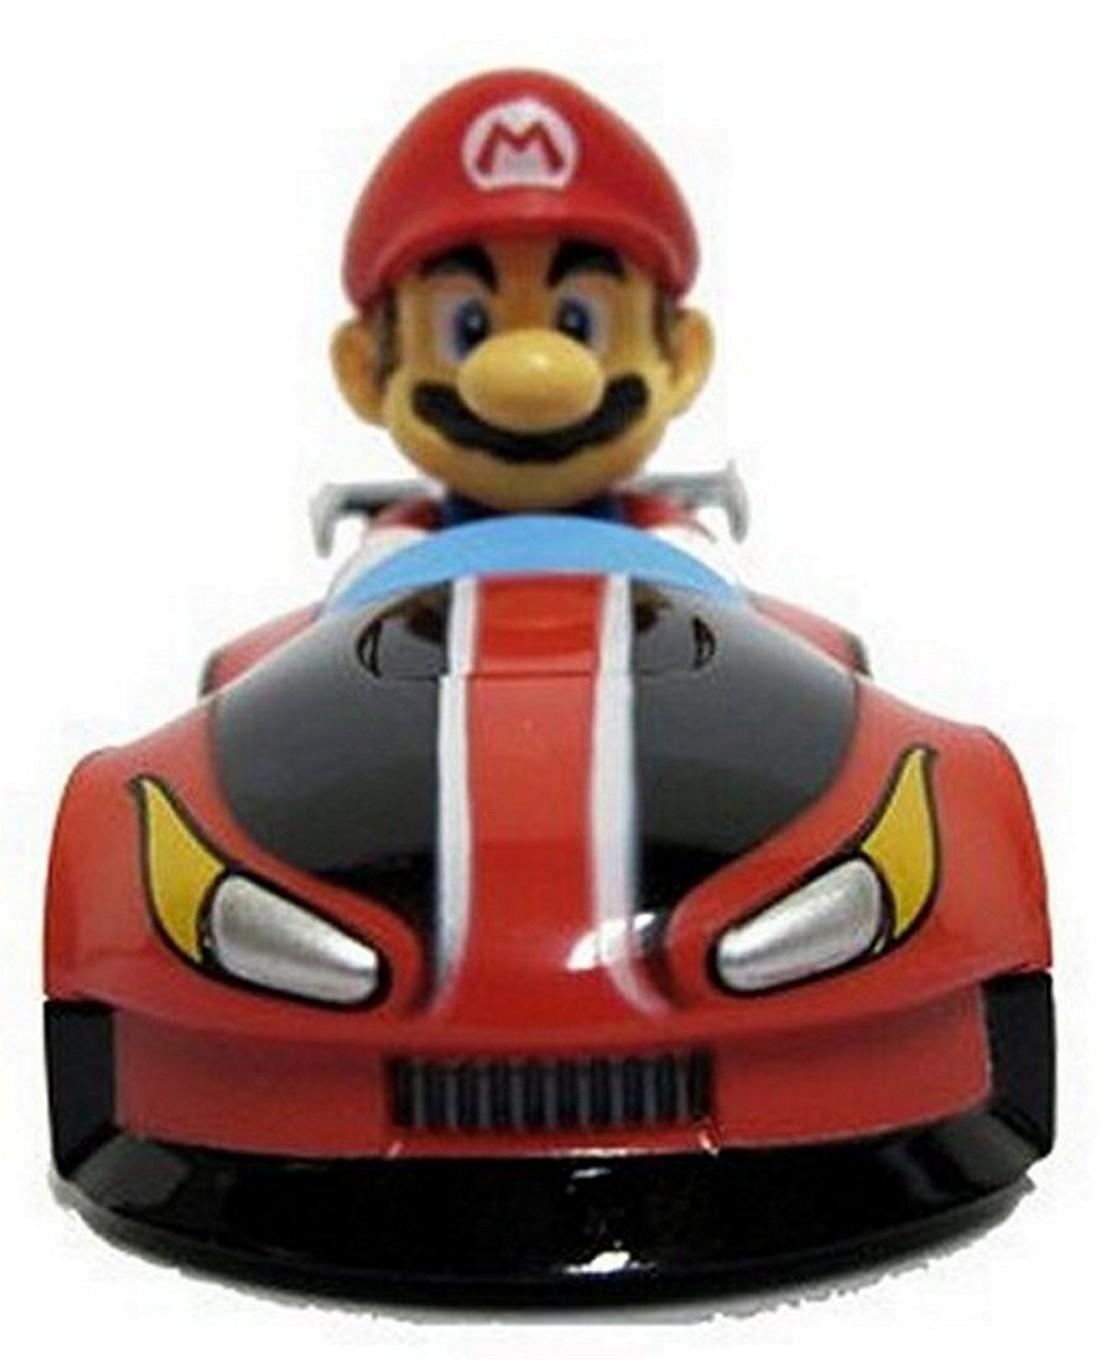 Nintendo mario kart 2010 wii pull back car mini figure 3 mario ebay - Mario kart wii voiture ...